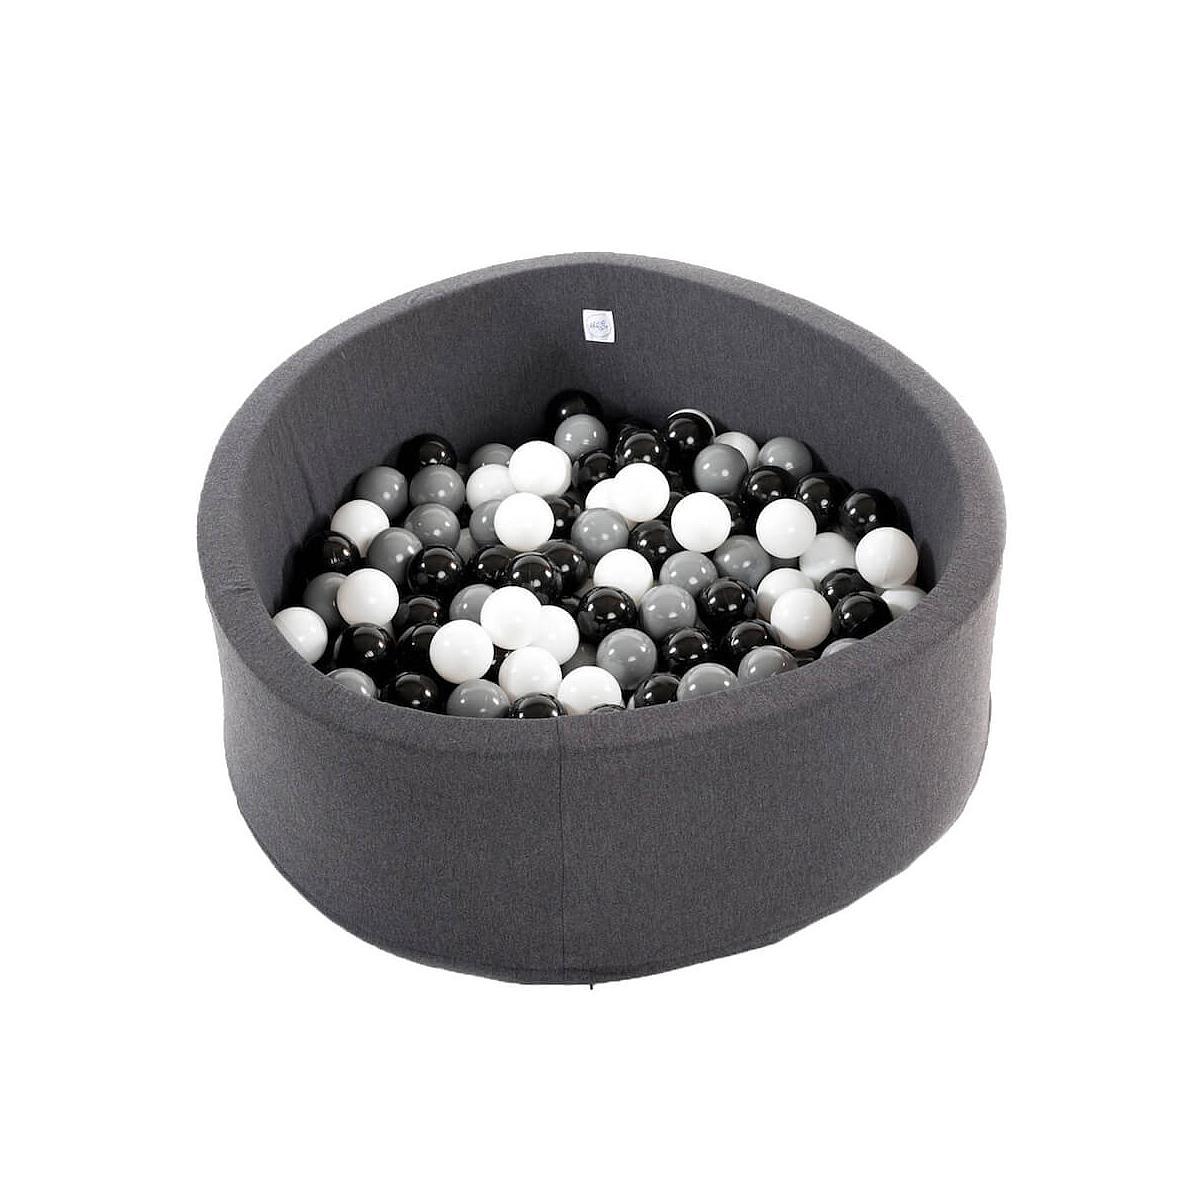 Piscina 200 bolas DARK GREY Minibe negro-blanco-gris